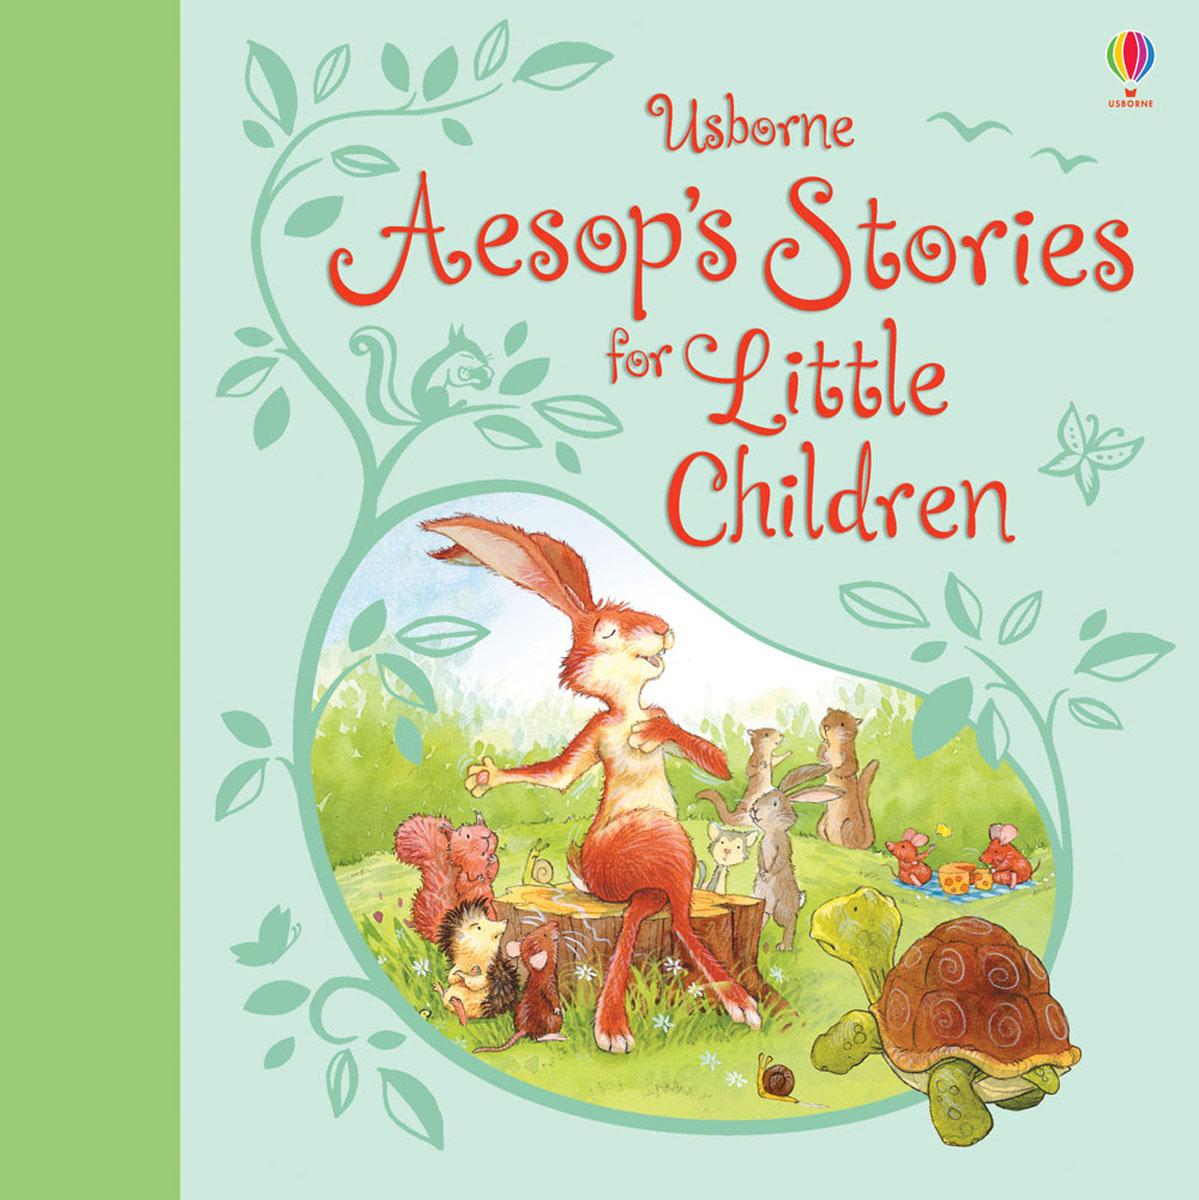 Aesop's Stories for Little Children fables book 6